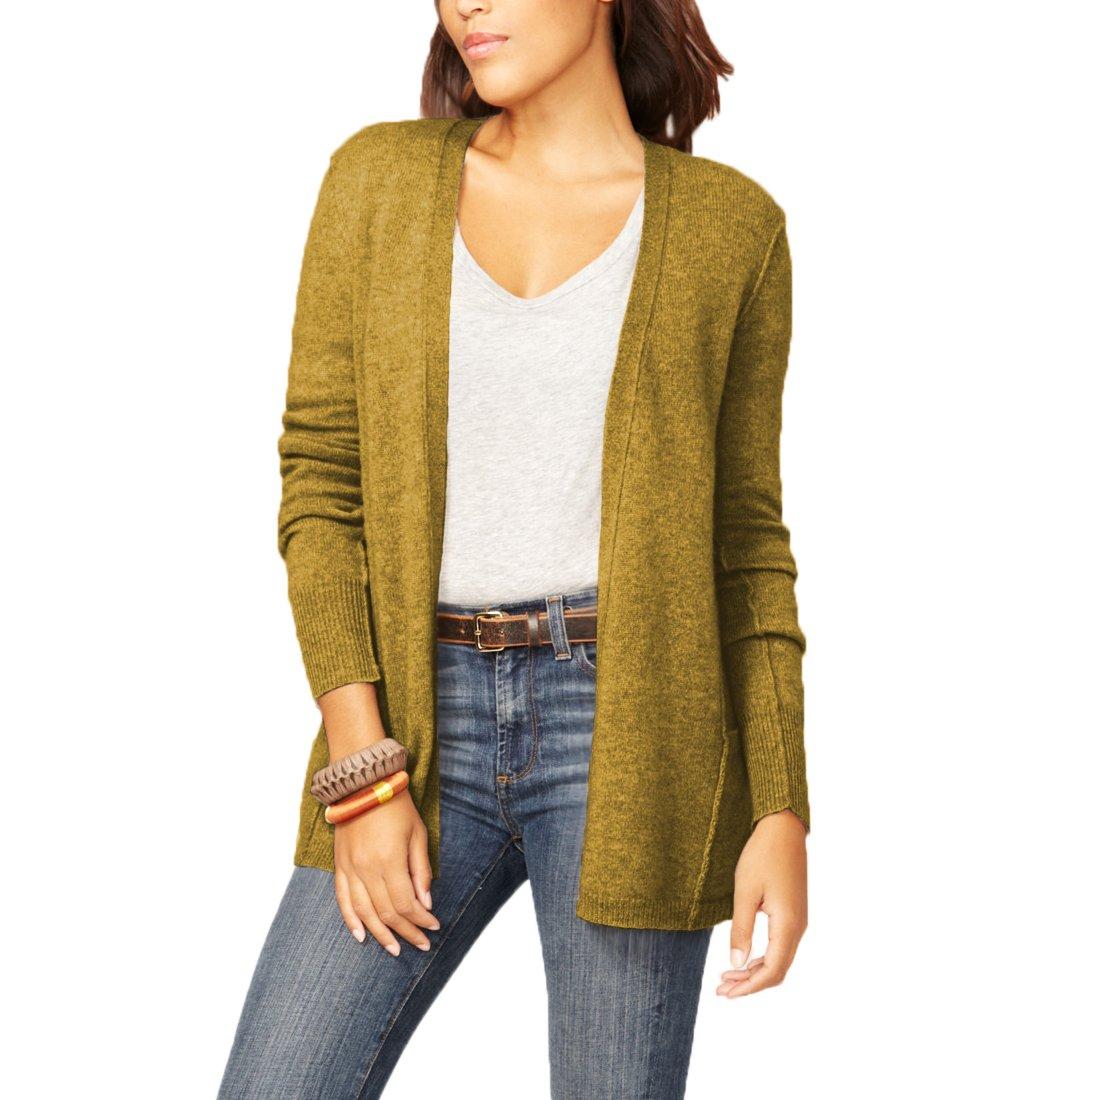 Parisbonbon Women's 100% Cashmere V-Neck Cardigan Color Goldenrod Size S